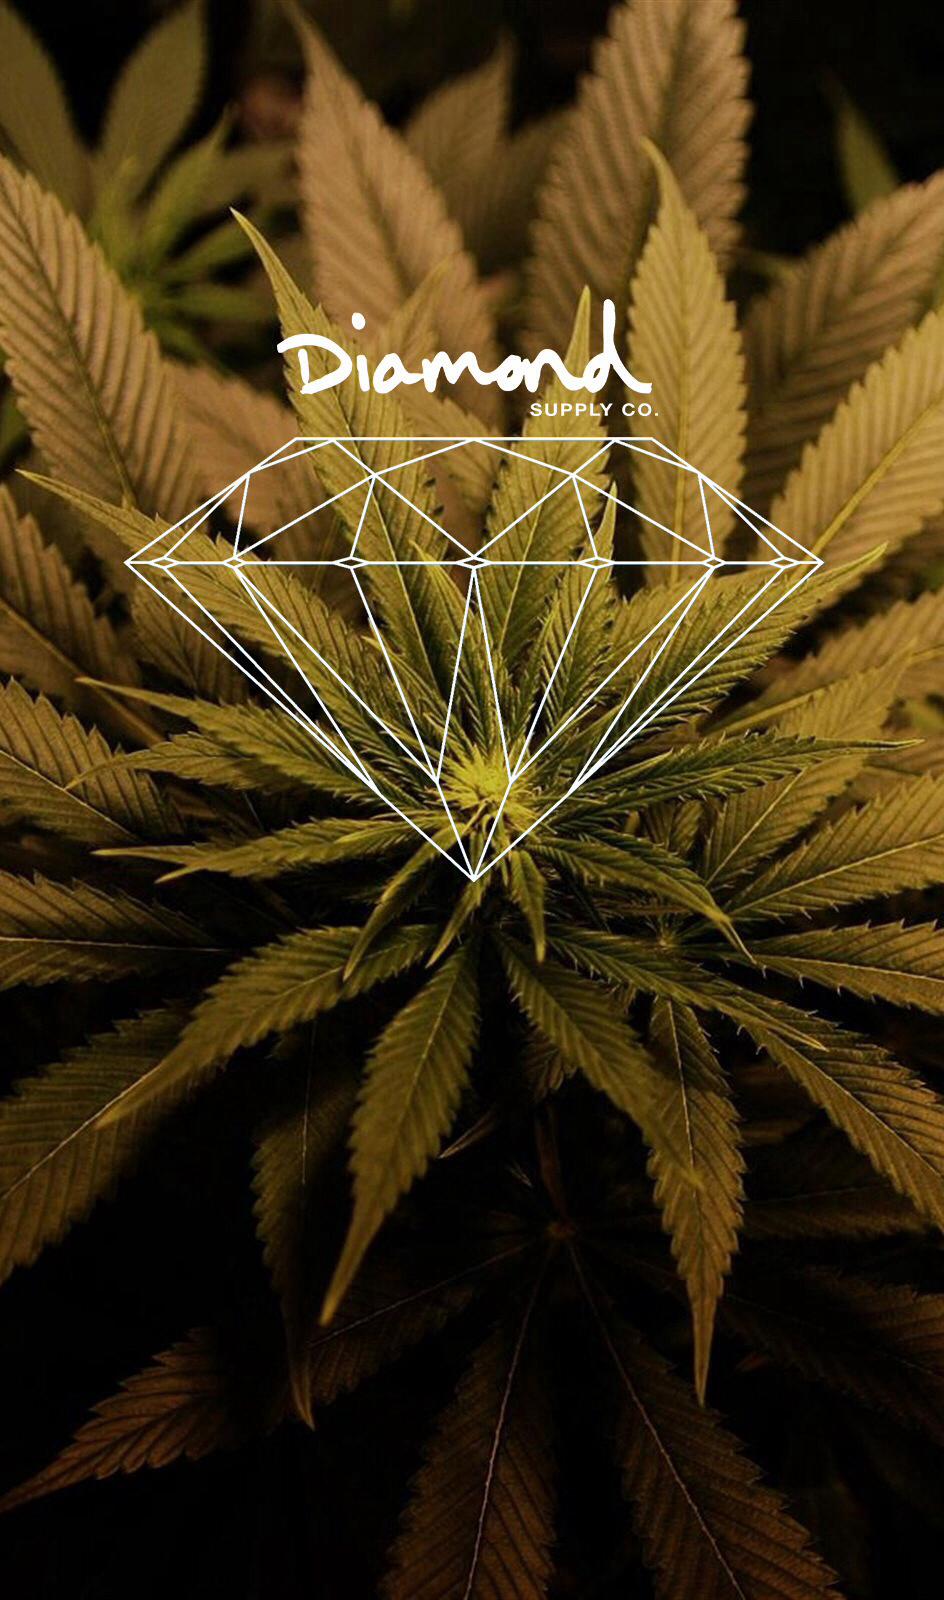 Wallpapers iPhone 5 diamondweed WALLPAPER Pinterest 944x1600